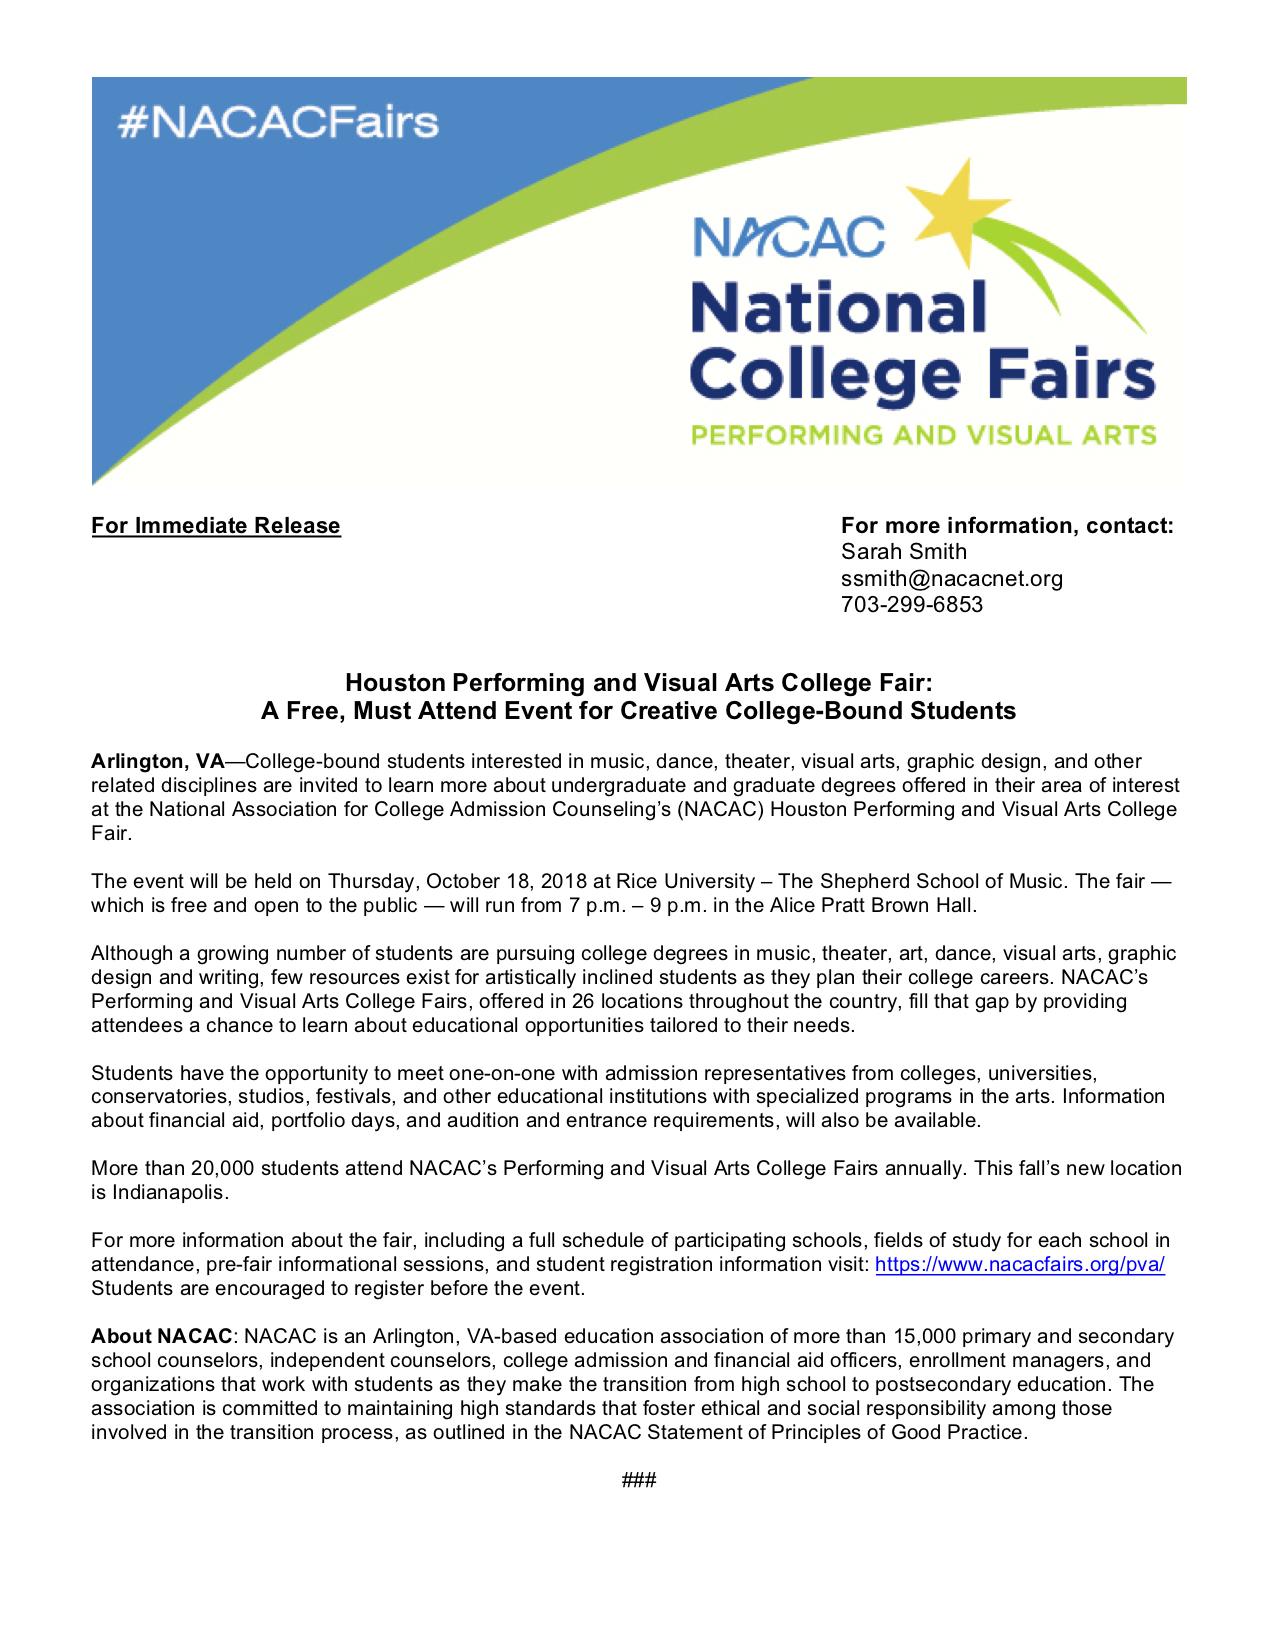 NACAC Performing and Visual Arts College Fair